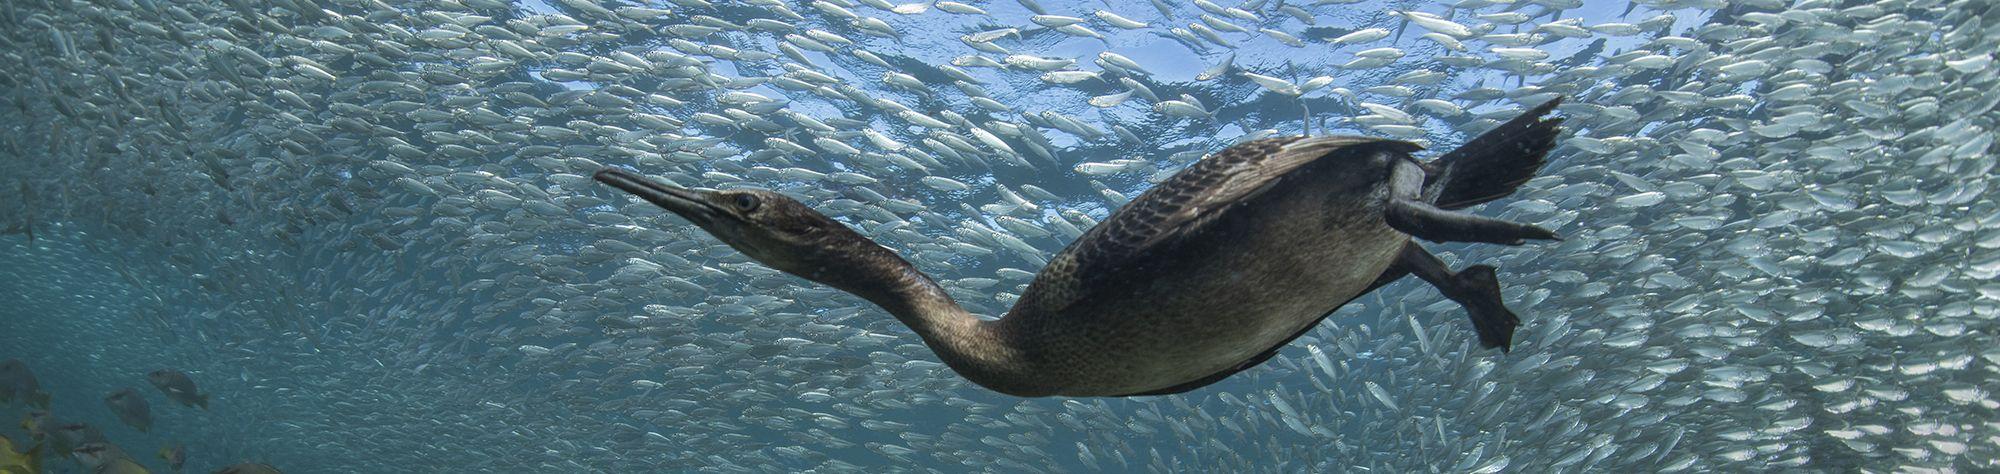 Webinar on seabird conservation now available